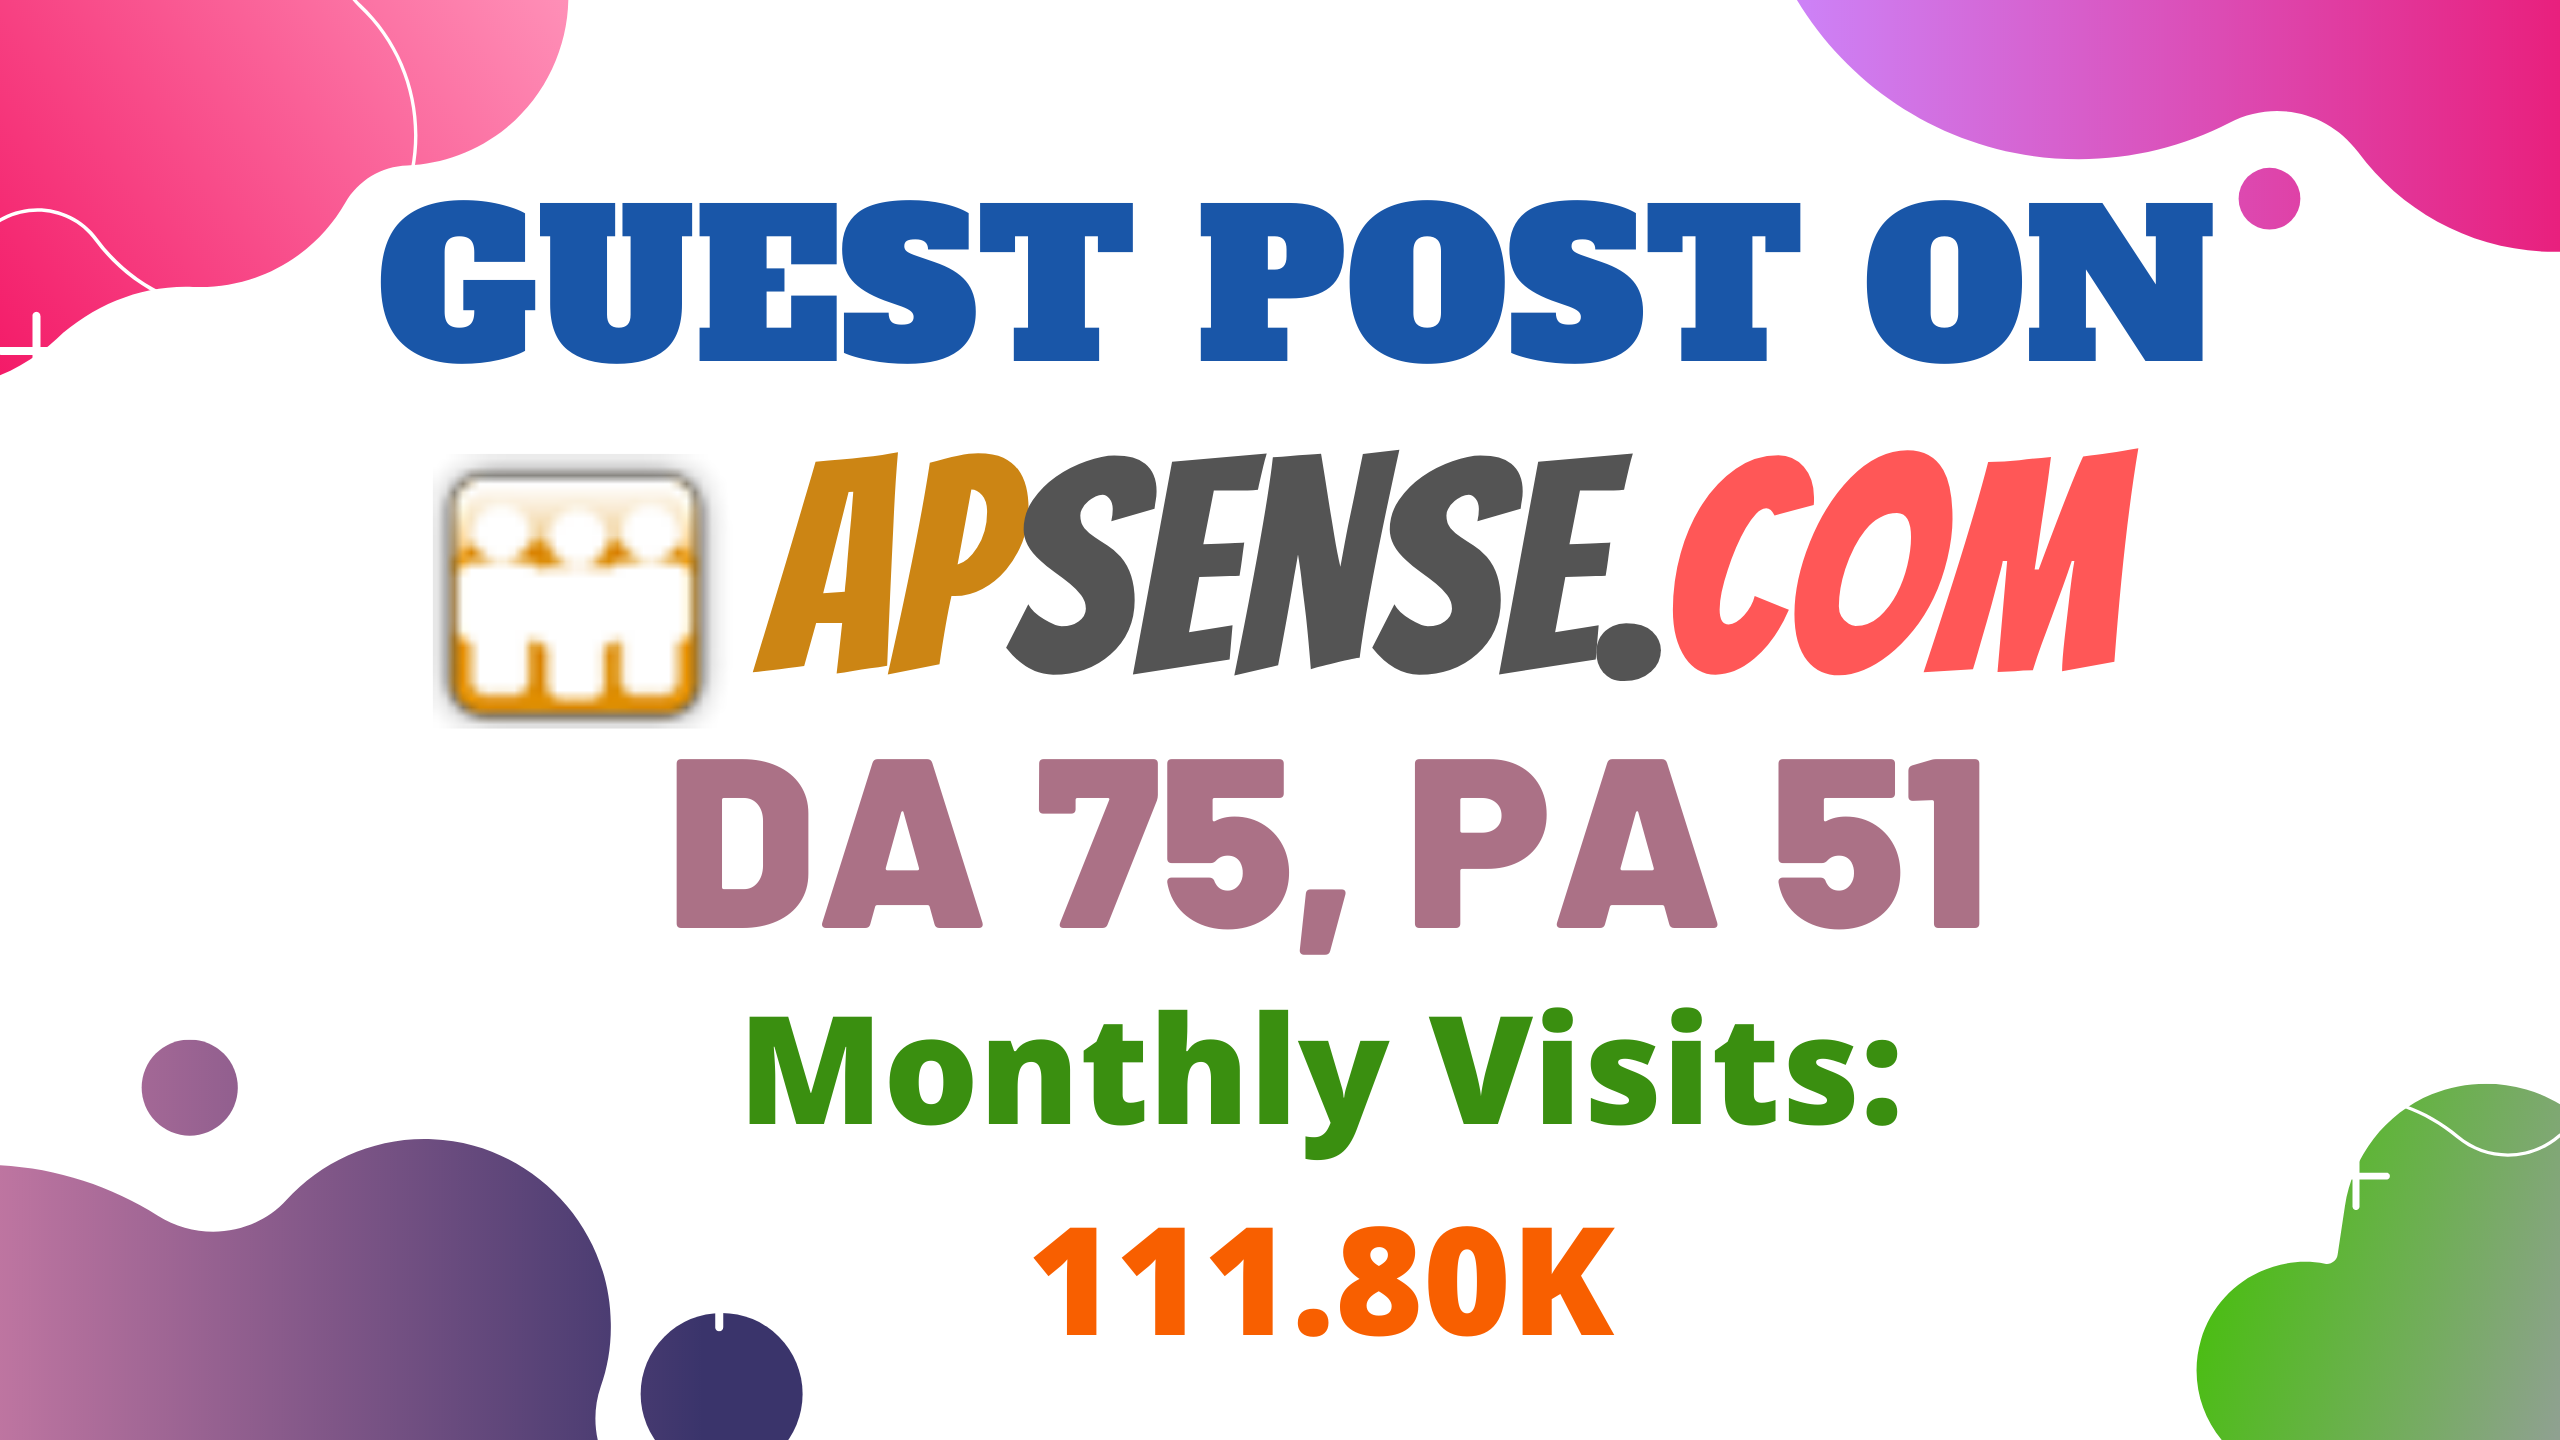 Publish Guest Post On High DA75 Business Networking Blog Apsense. com